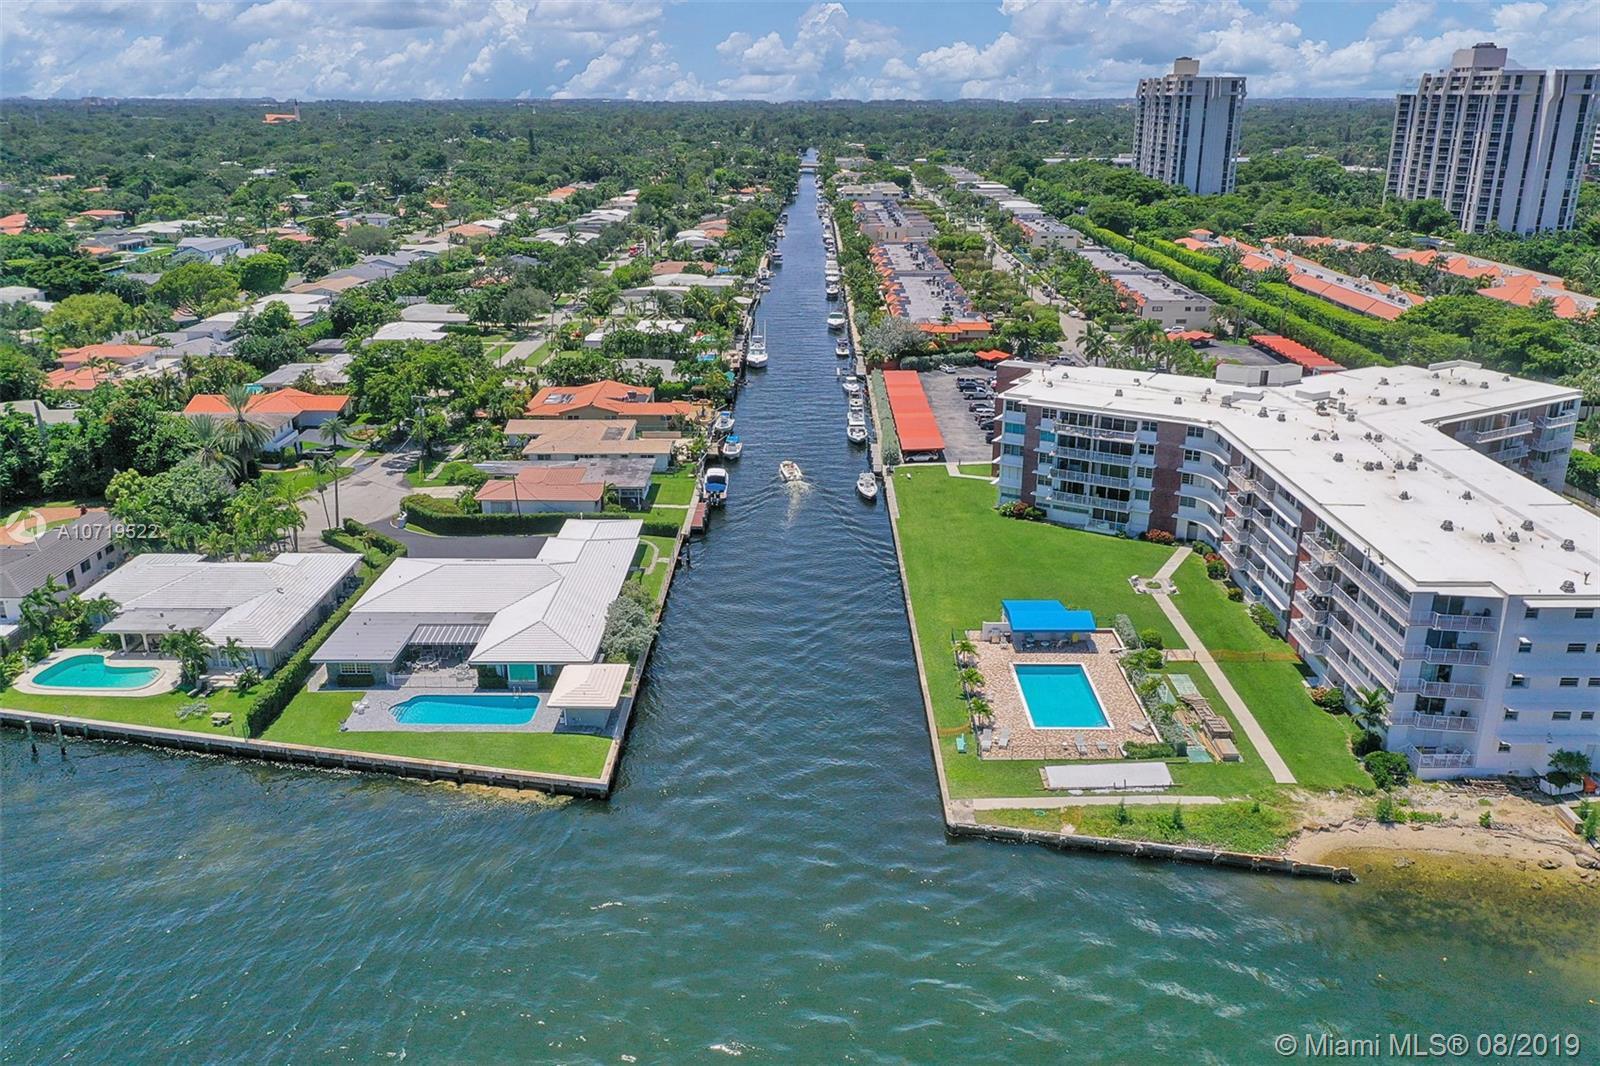 Miami Shores #B-12 - 24 - photo